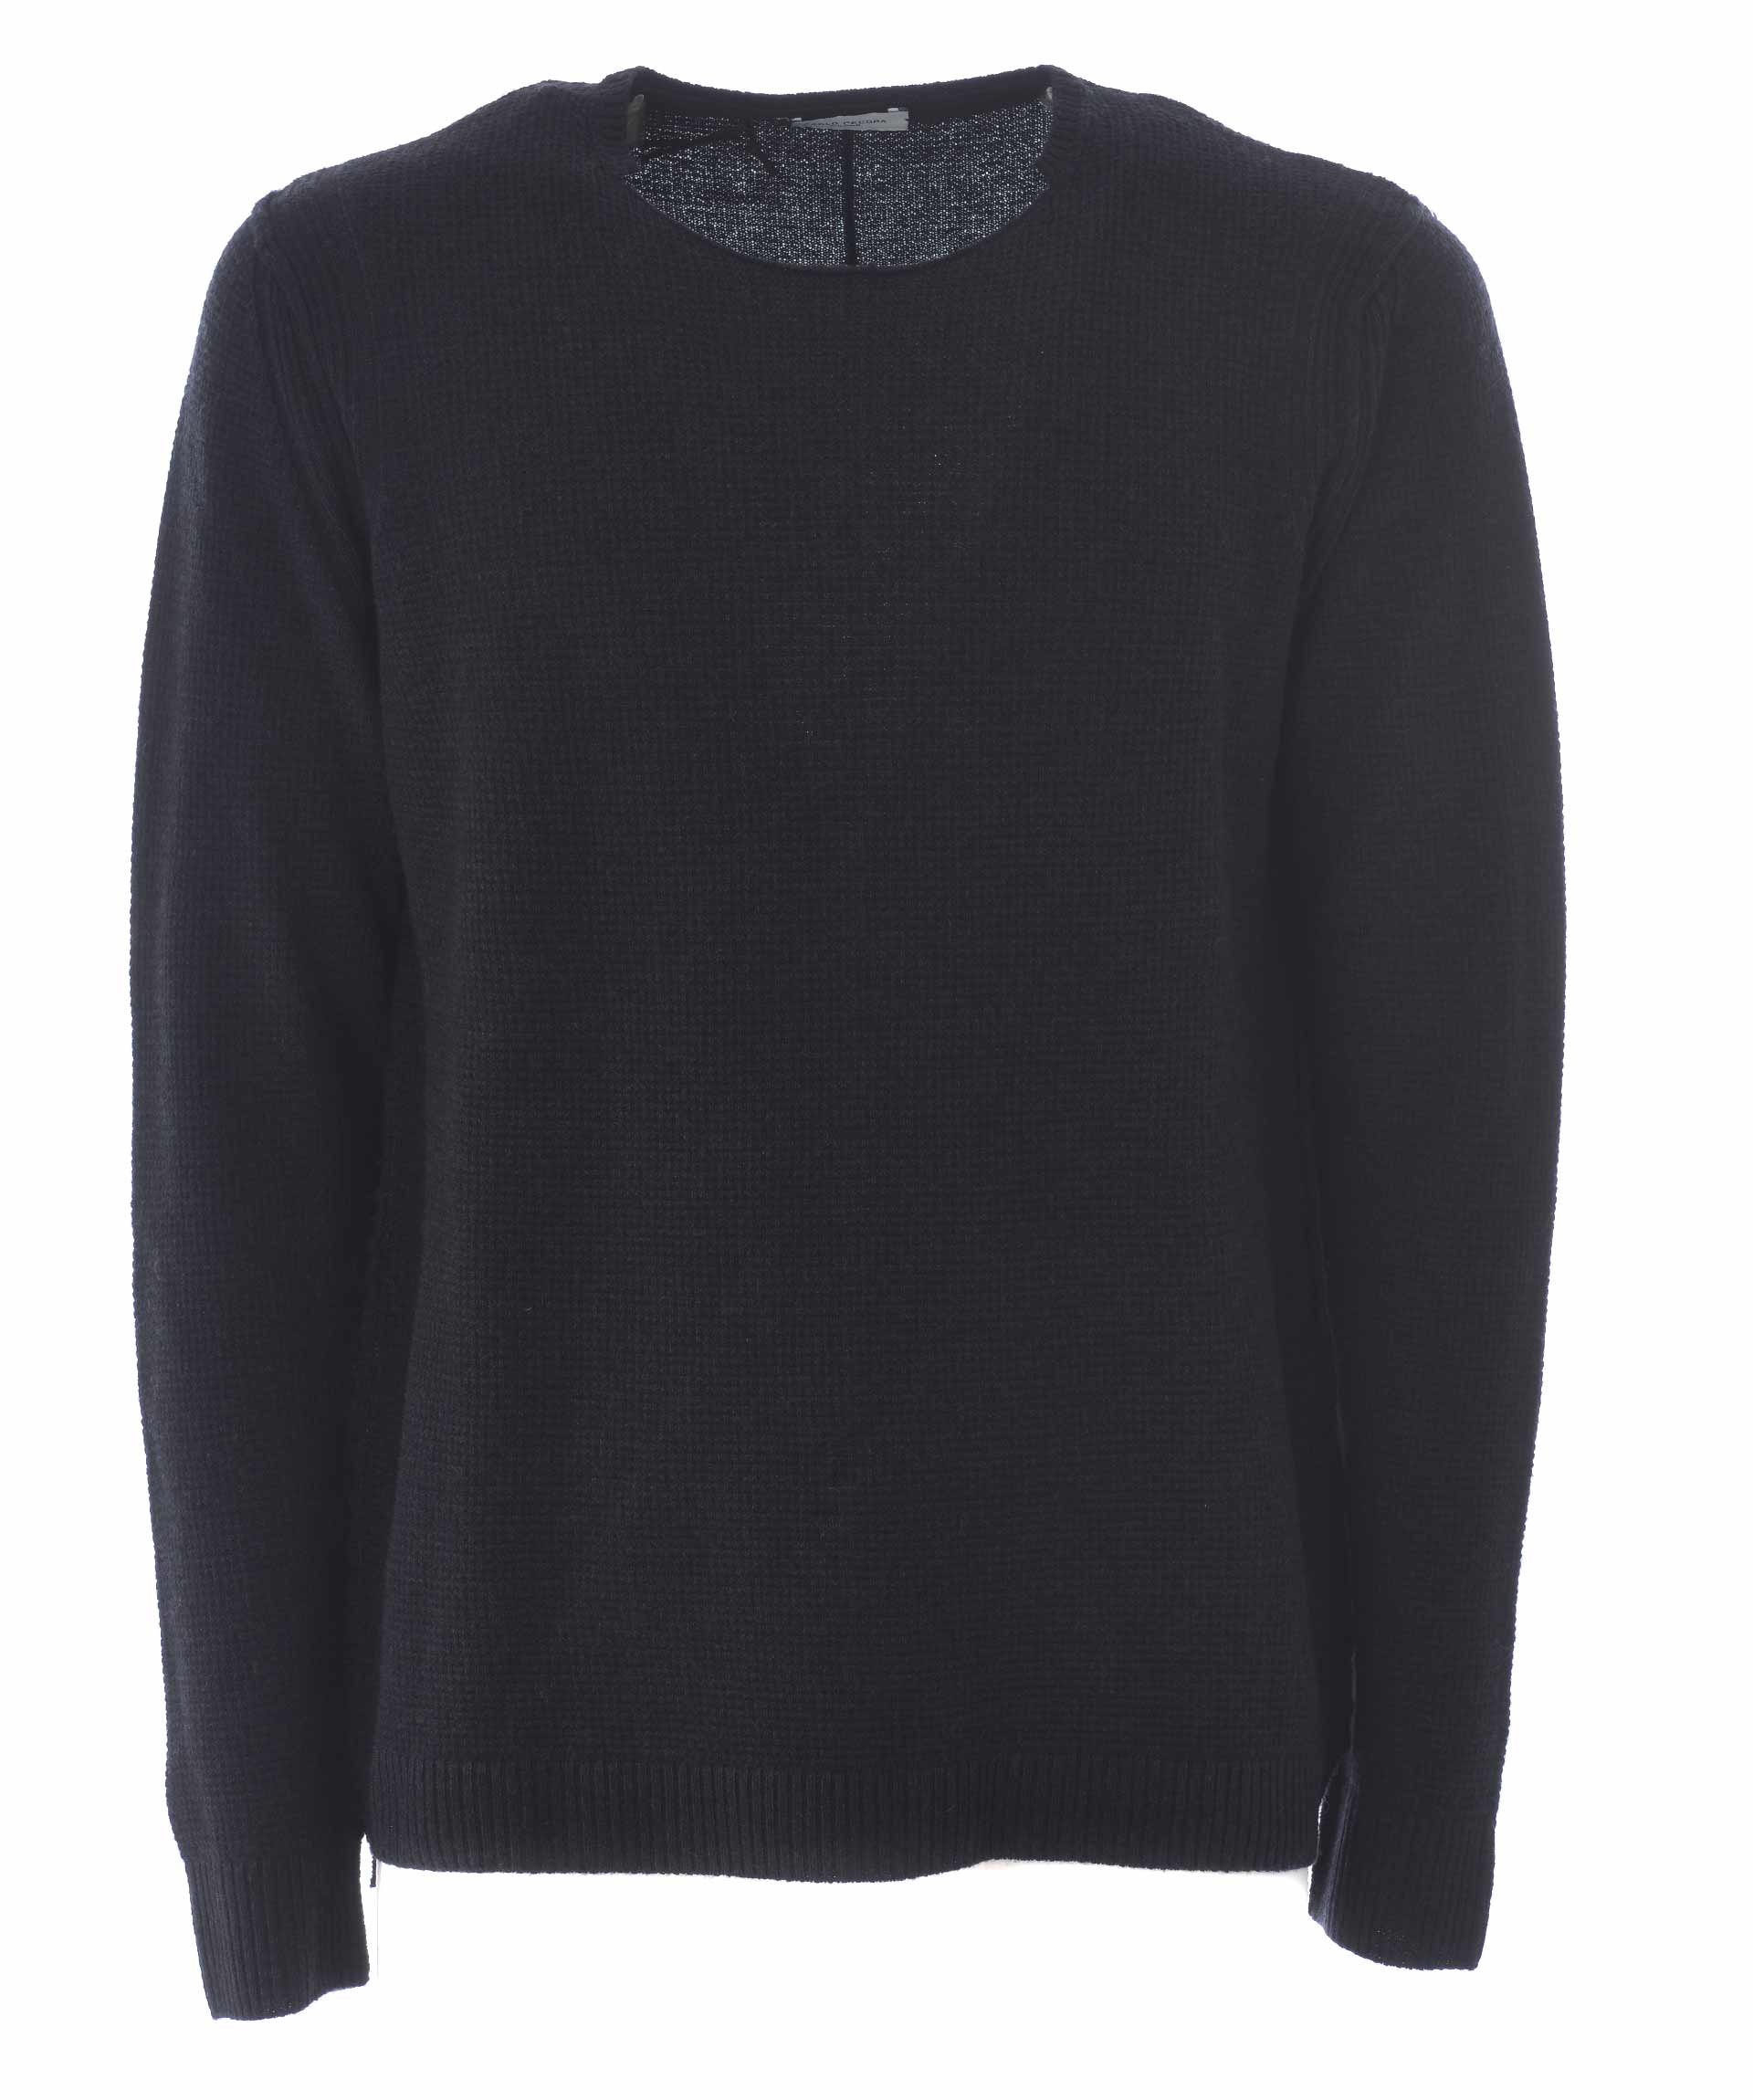 Paolo Pecora Classic Sweater